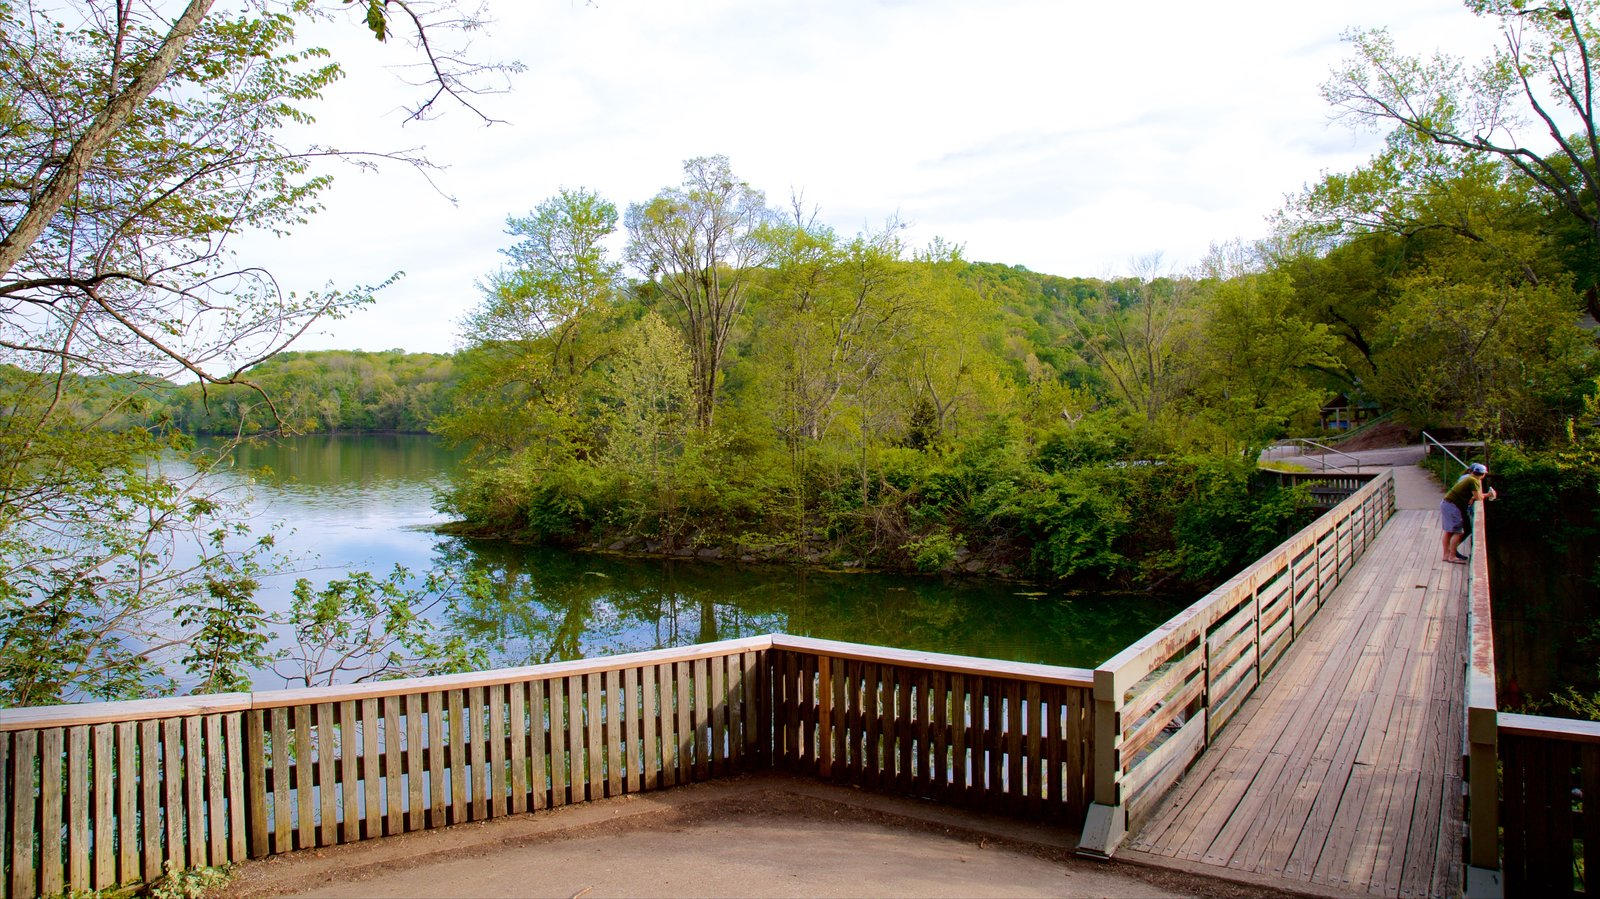 Radnor Lake State Park